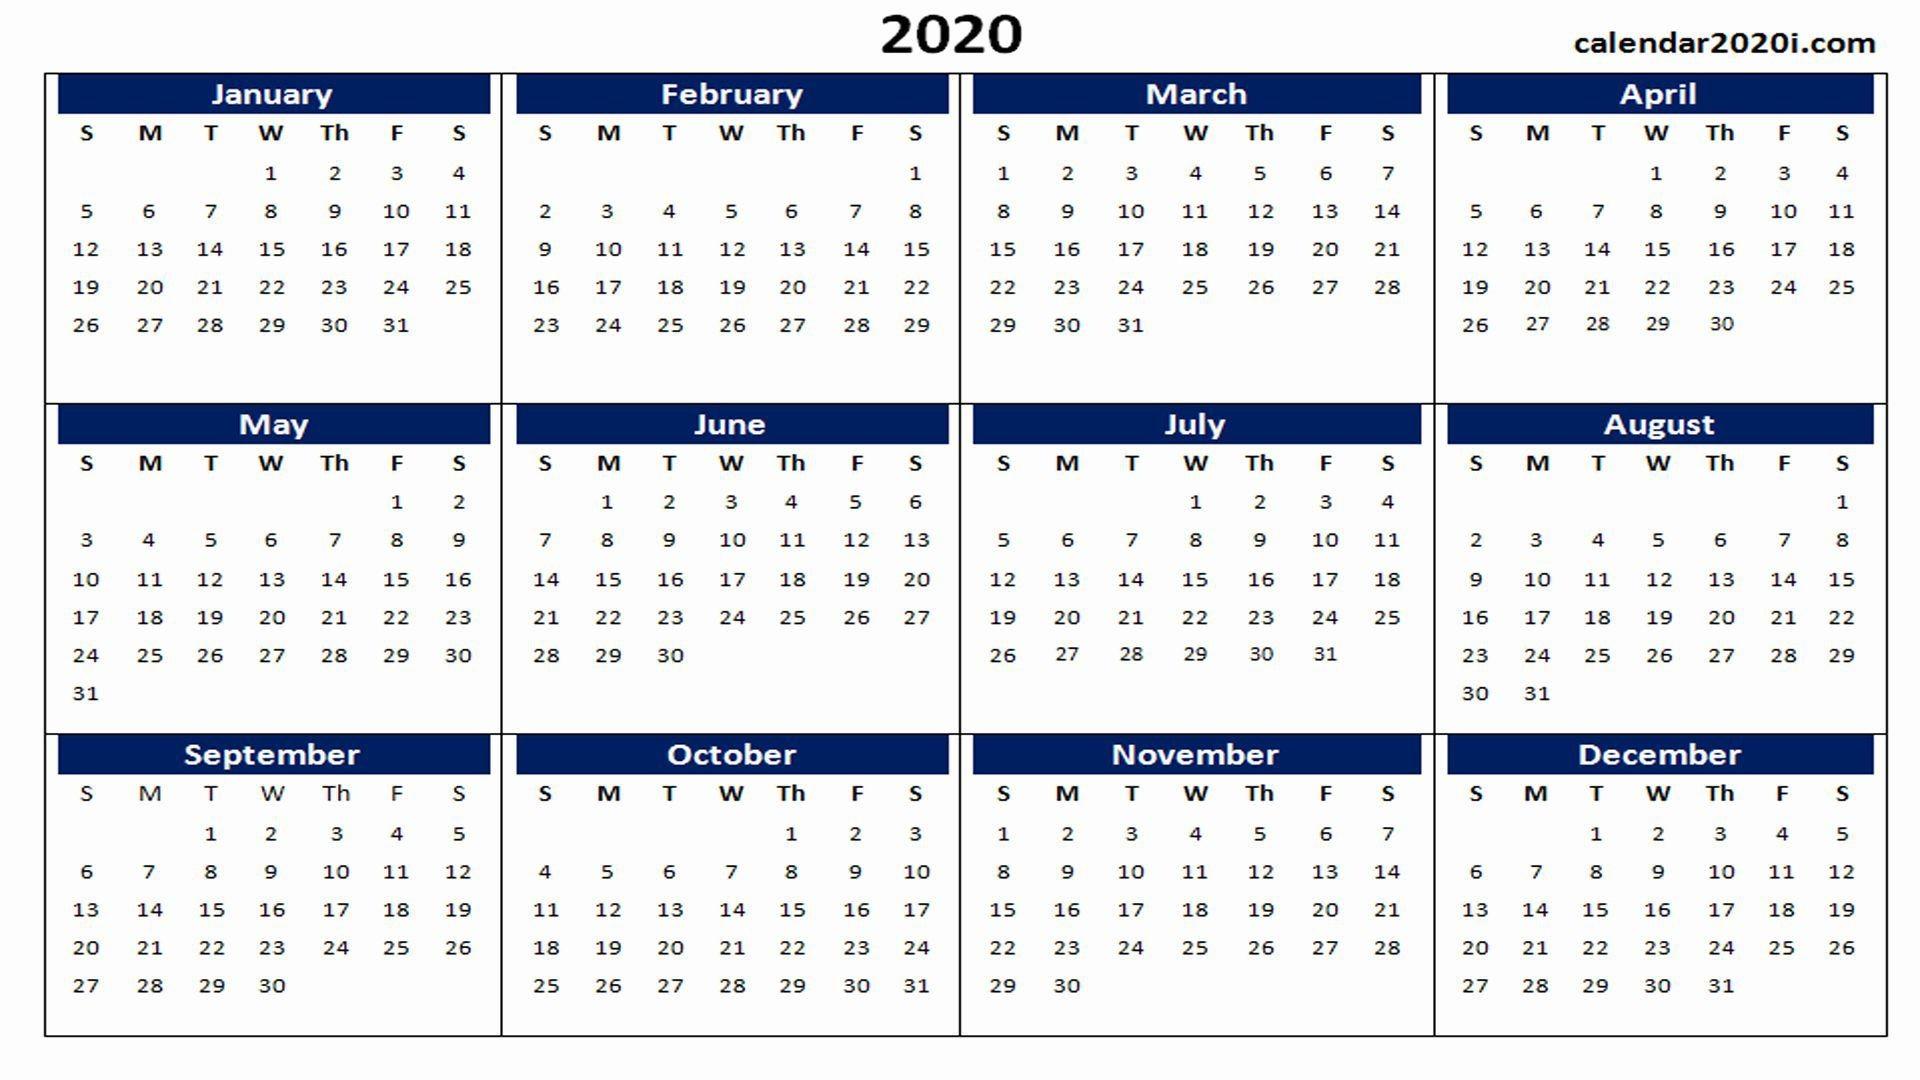 000 Impressive 2020 Yearly Calendar Template Sample  Word Uk1920